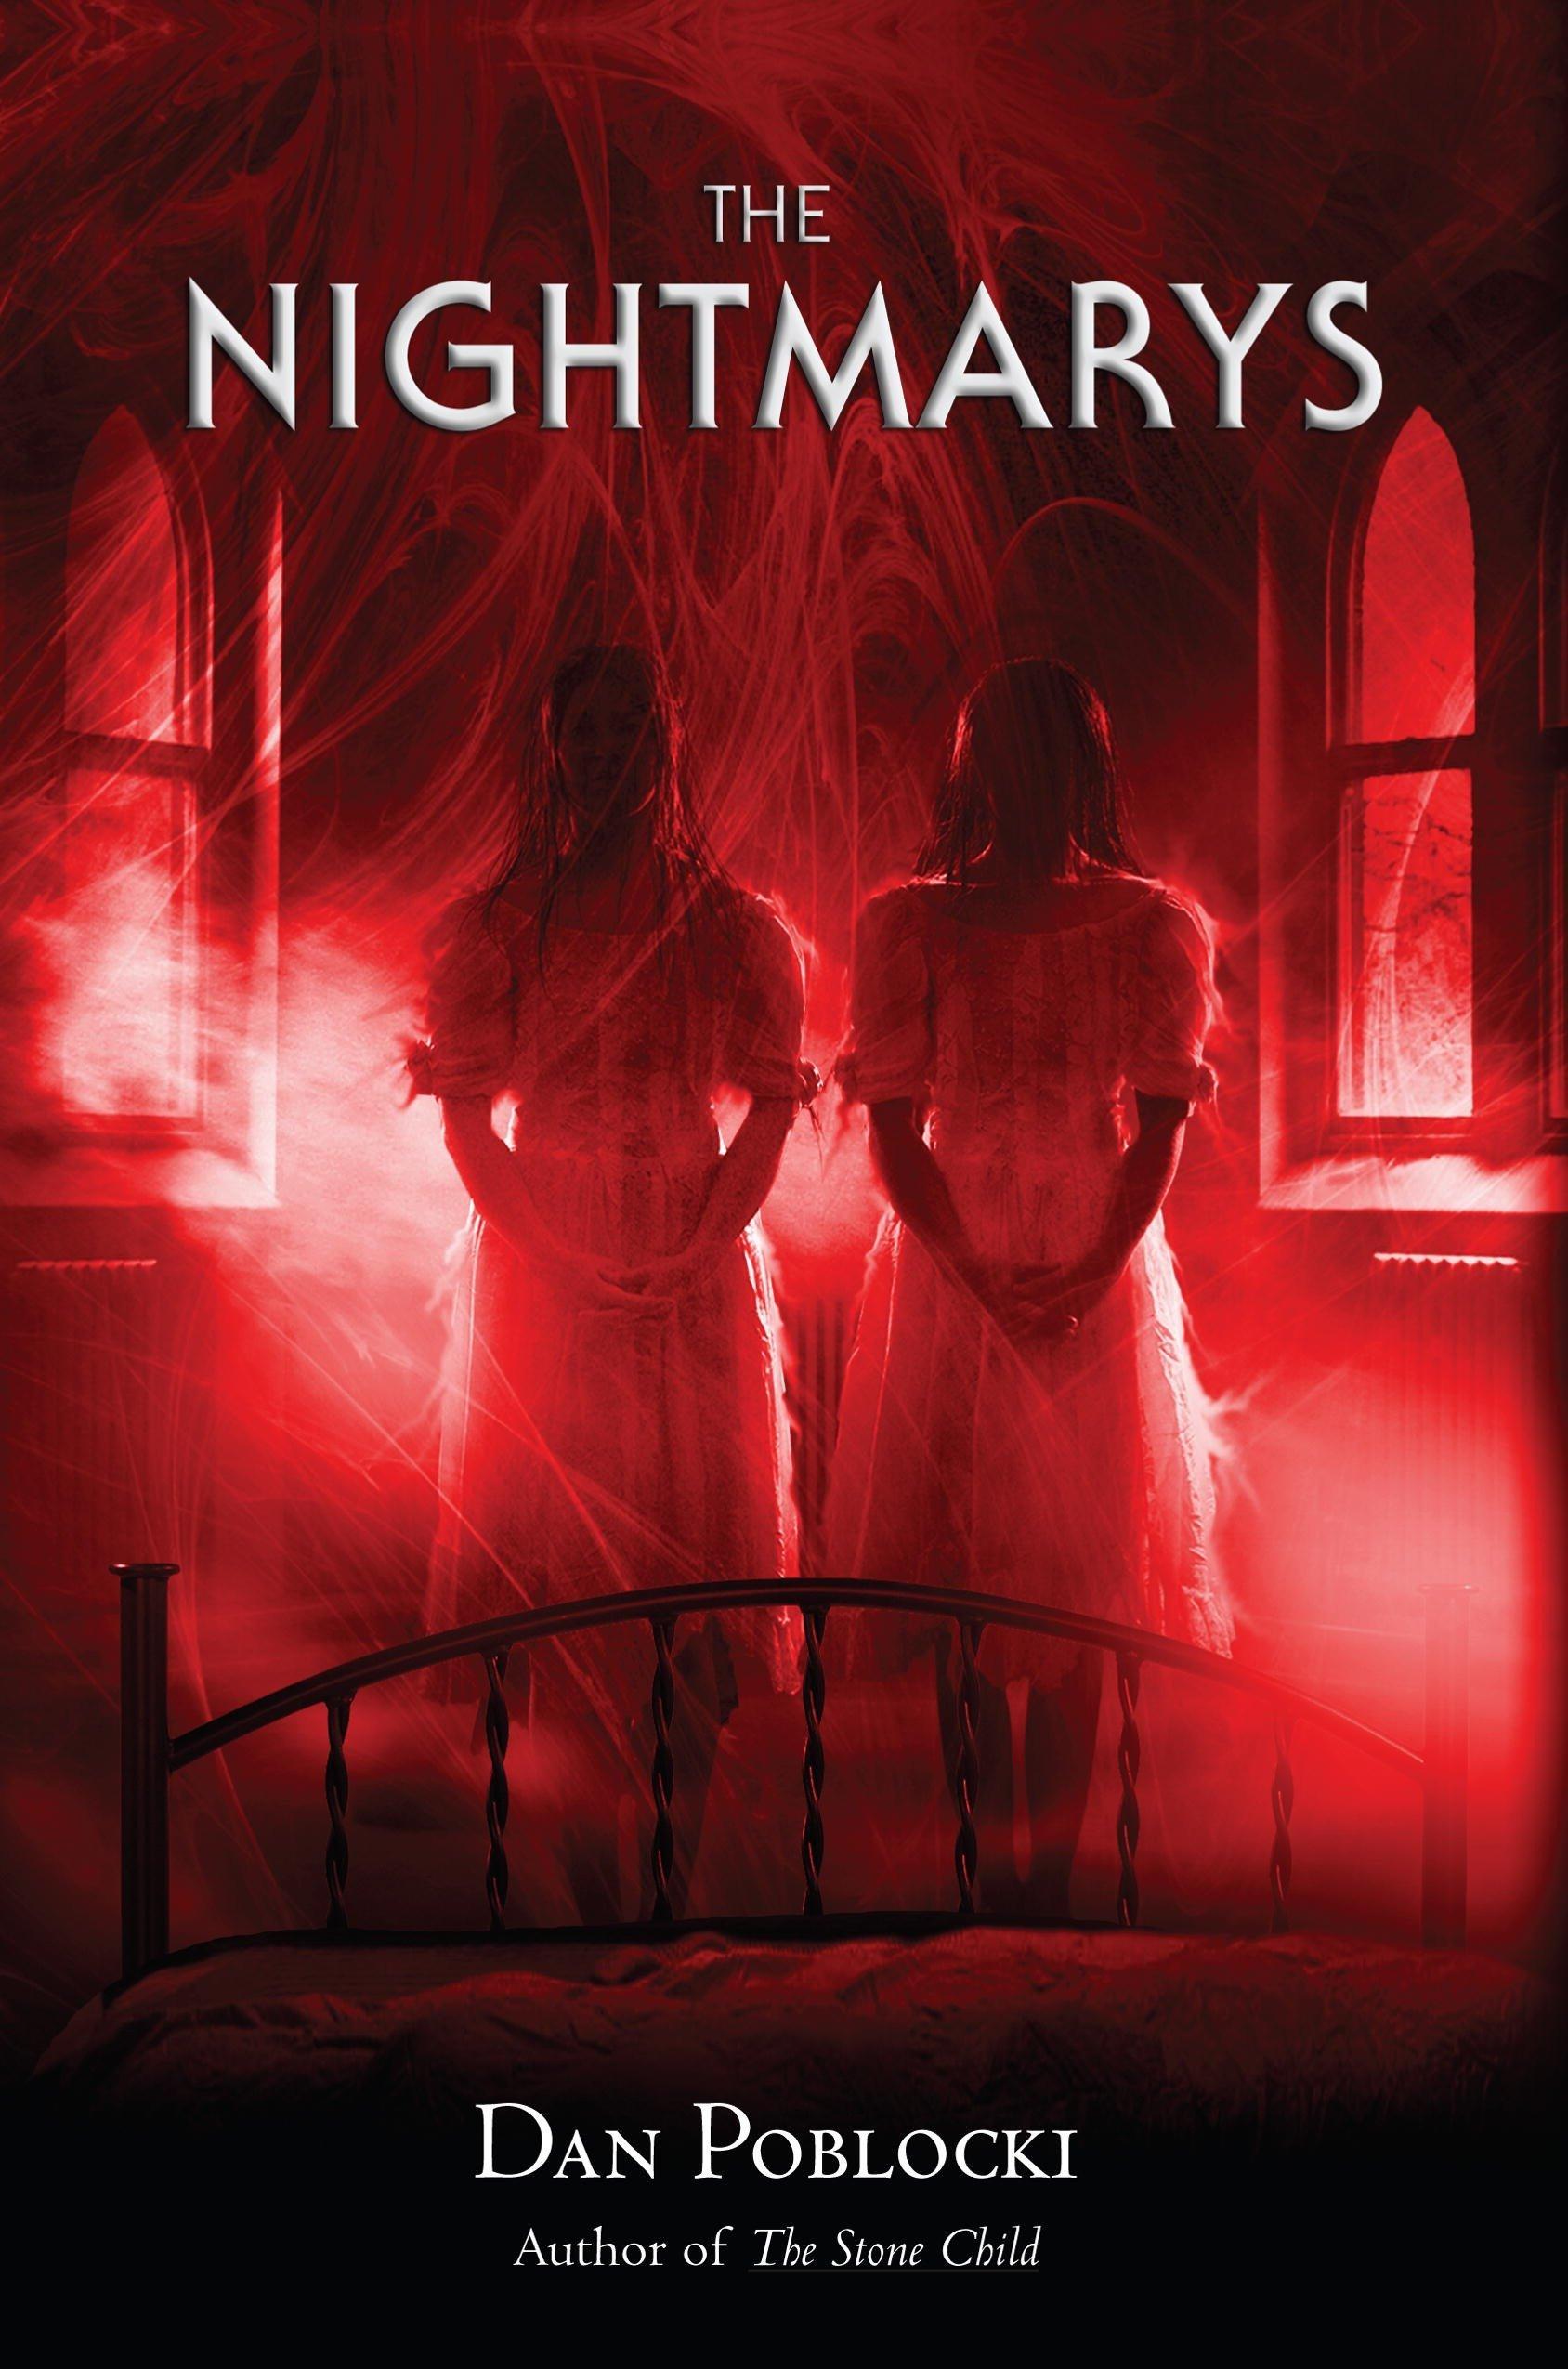 The Nightmarys ebook